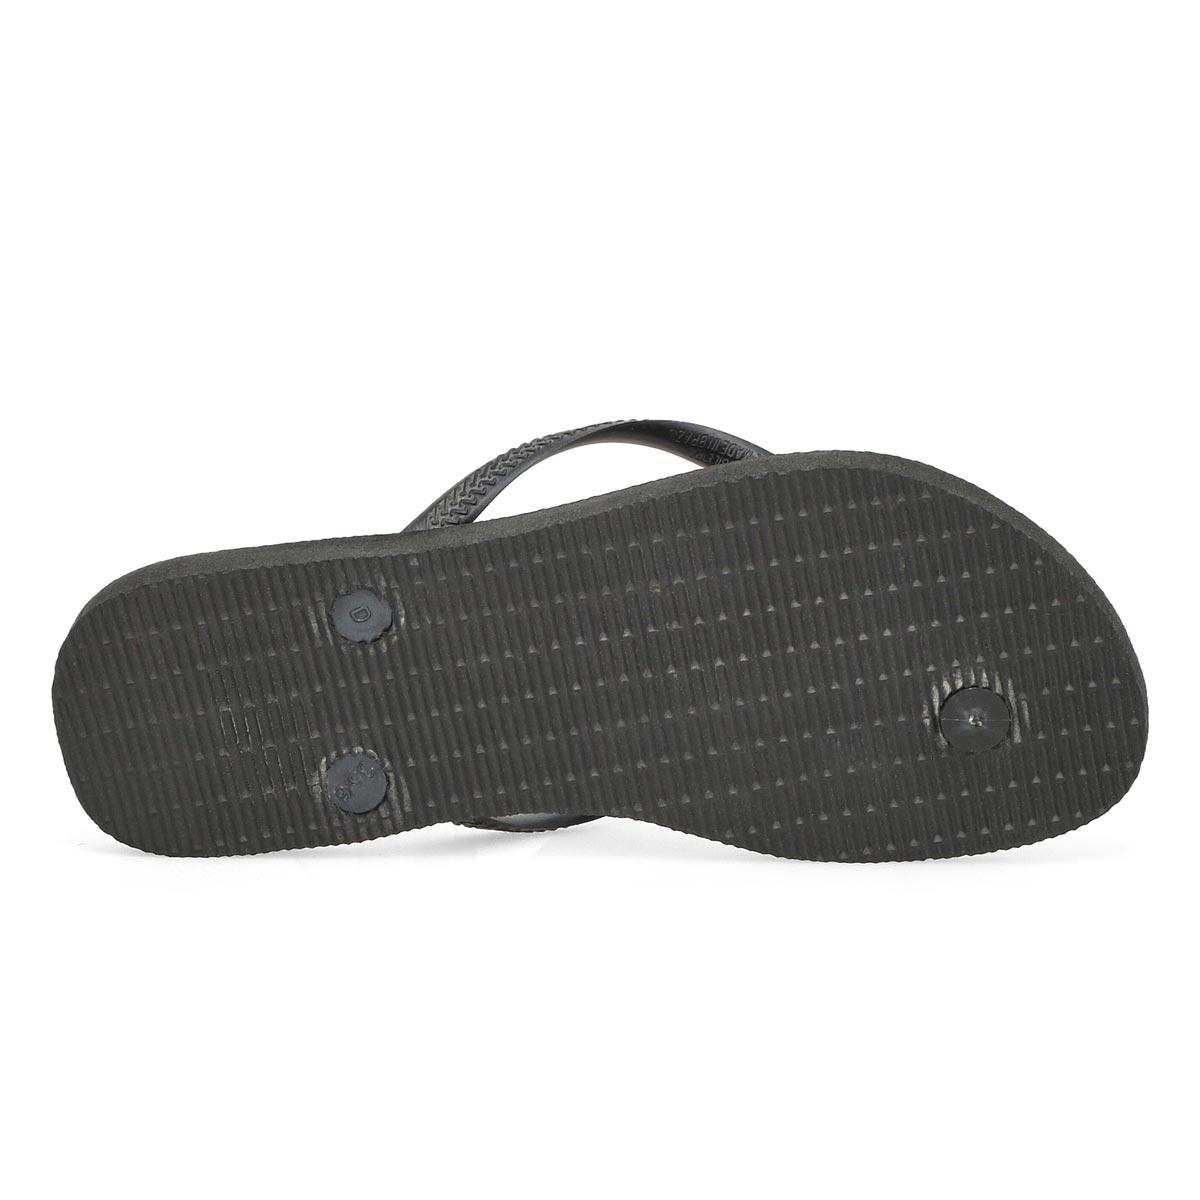 Women's Slim Flip Flop - Black